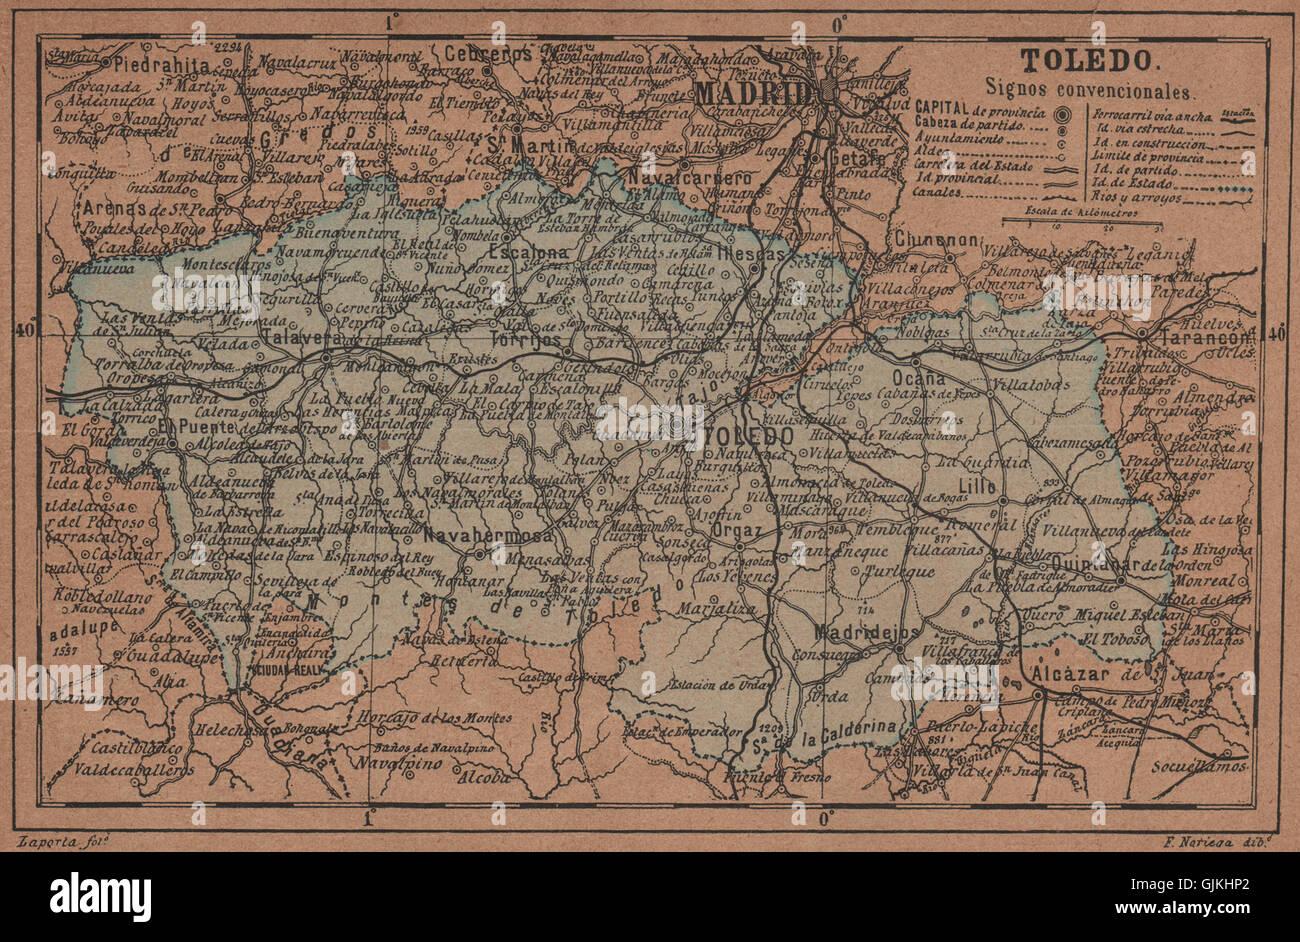 TOLEDO CastillaLa Mancha Mapa antiguo de la provincia 1905